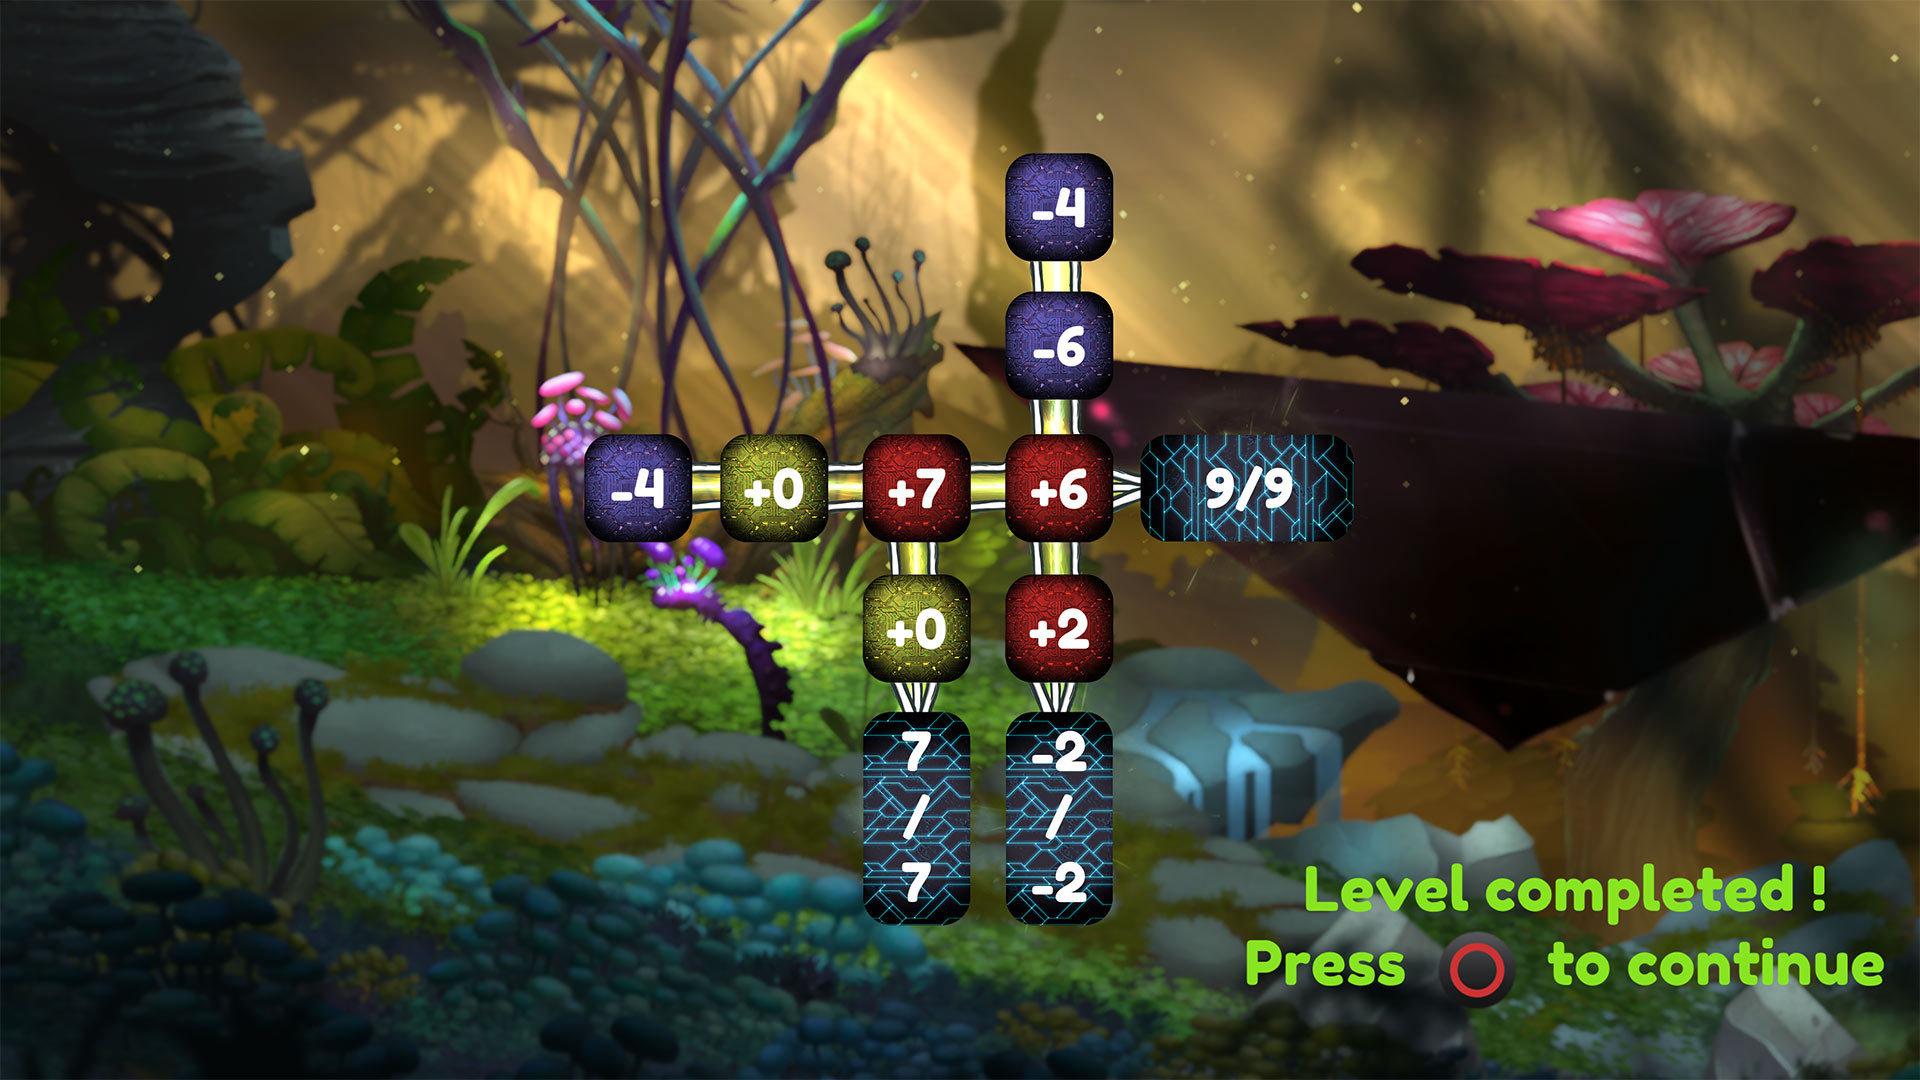 ballance 2 pc game free download full version